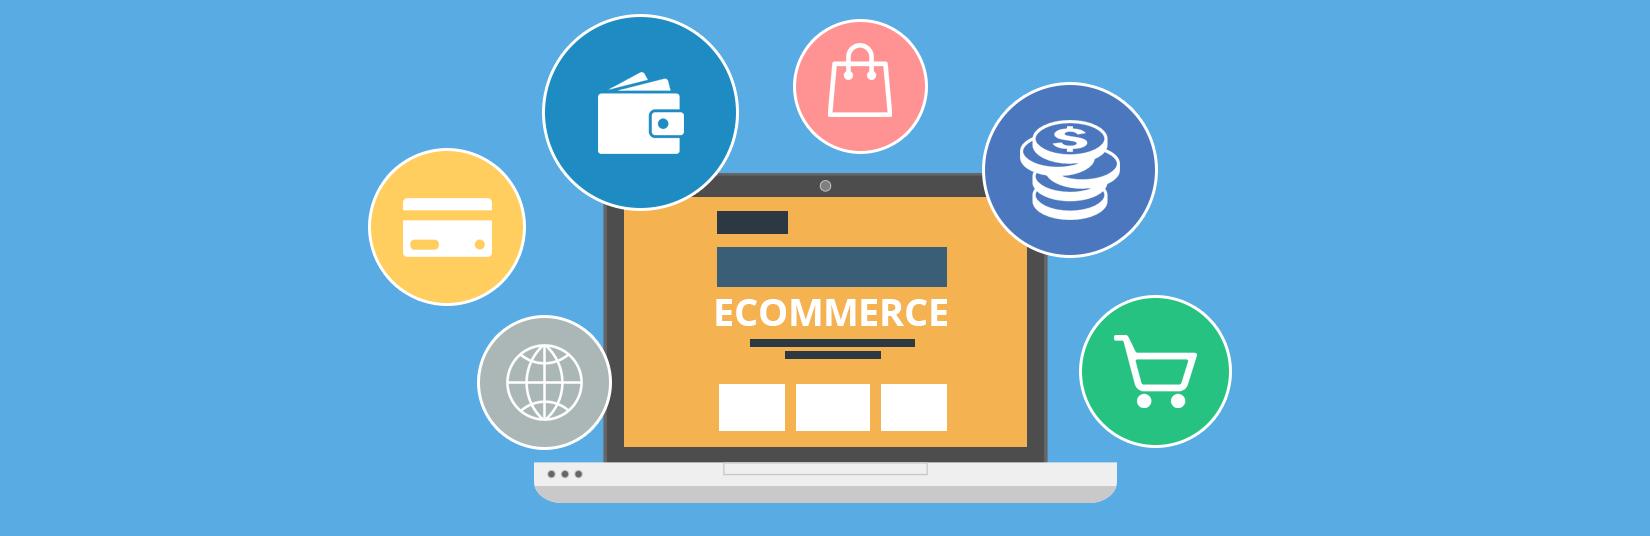 e-commerce, web development, loja online